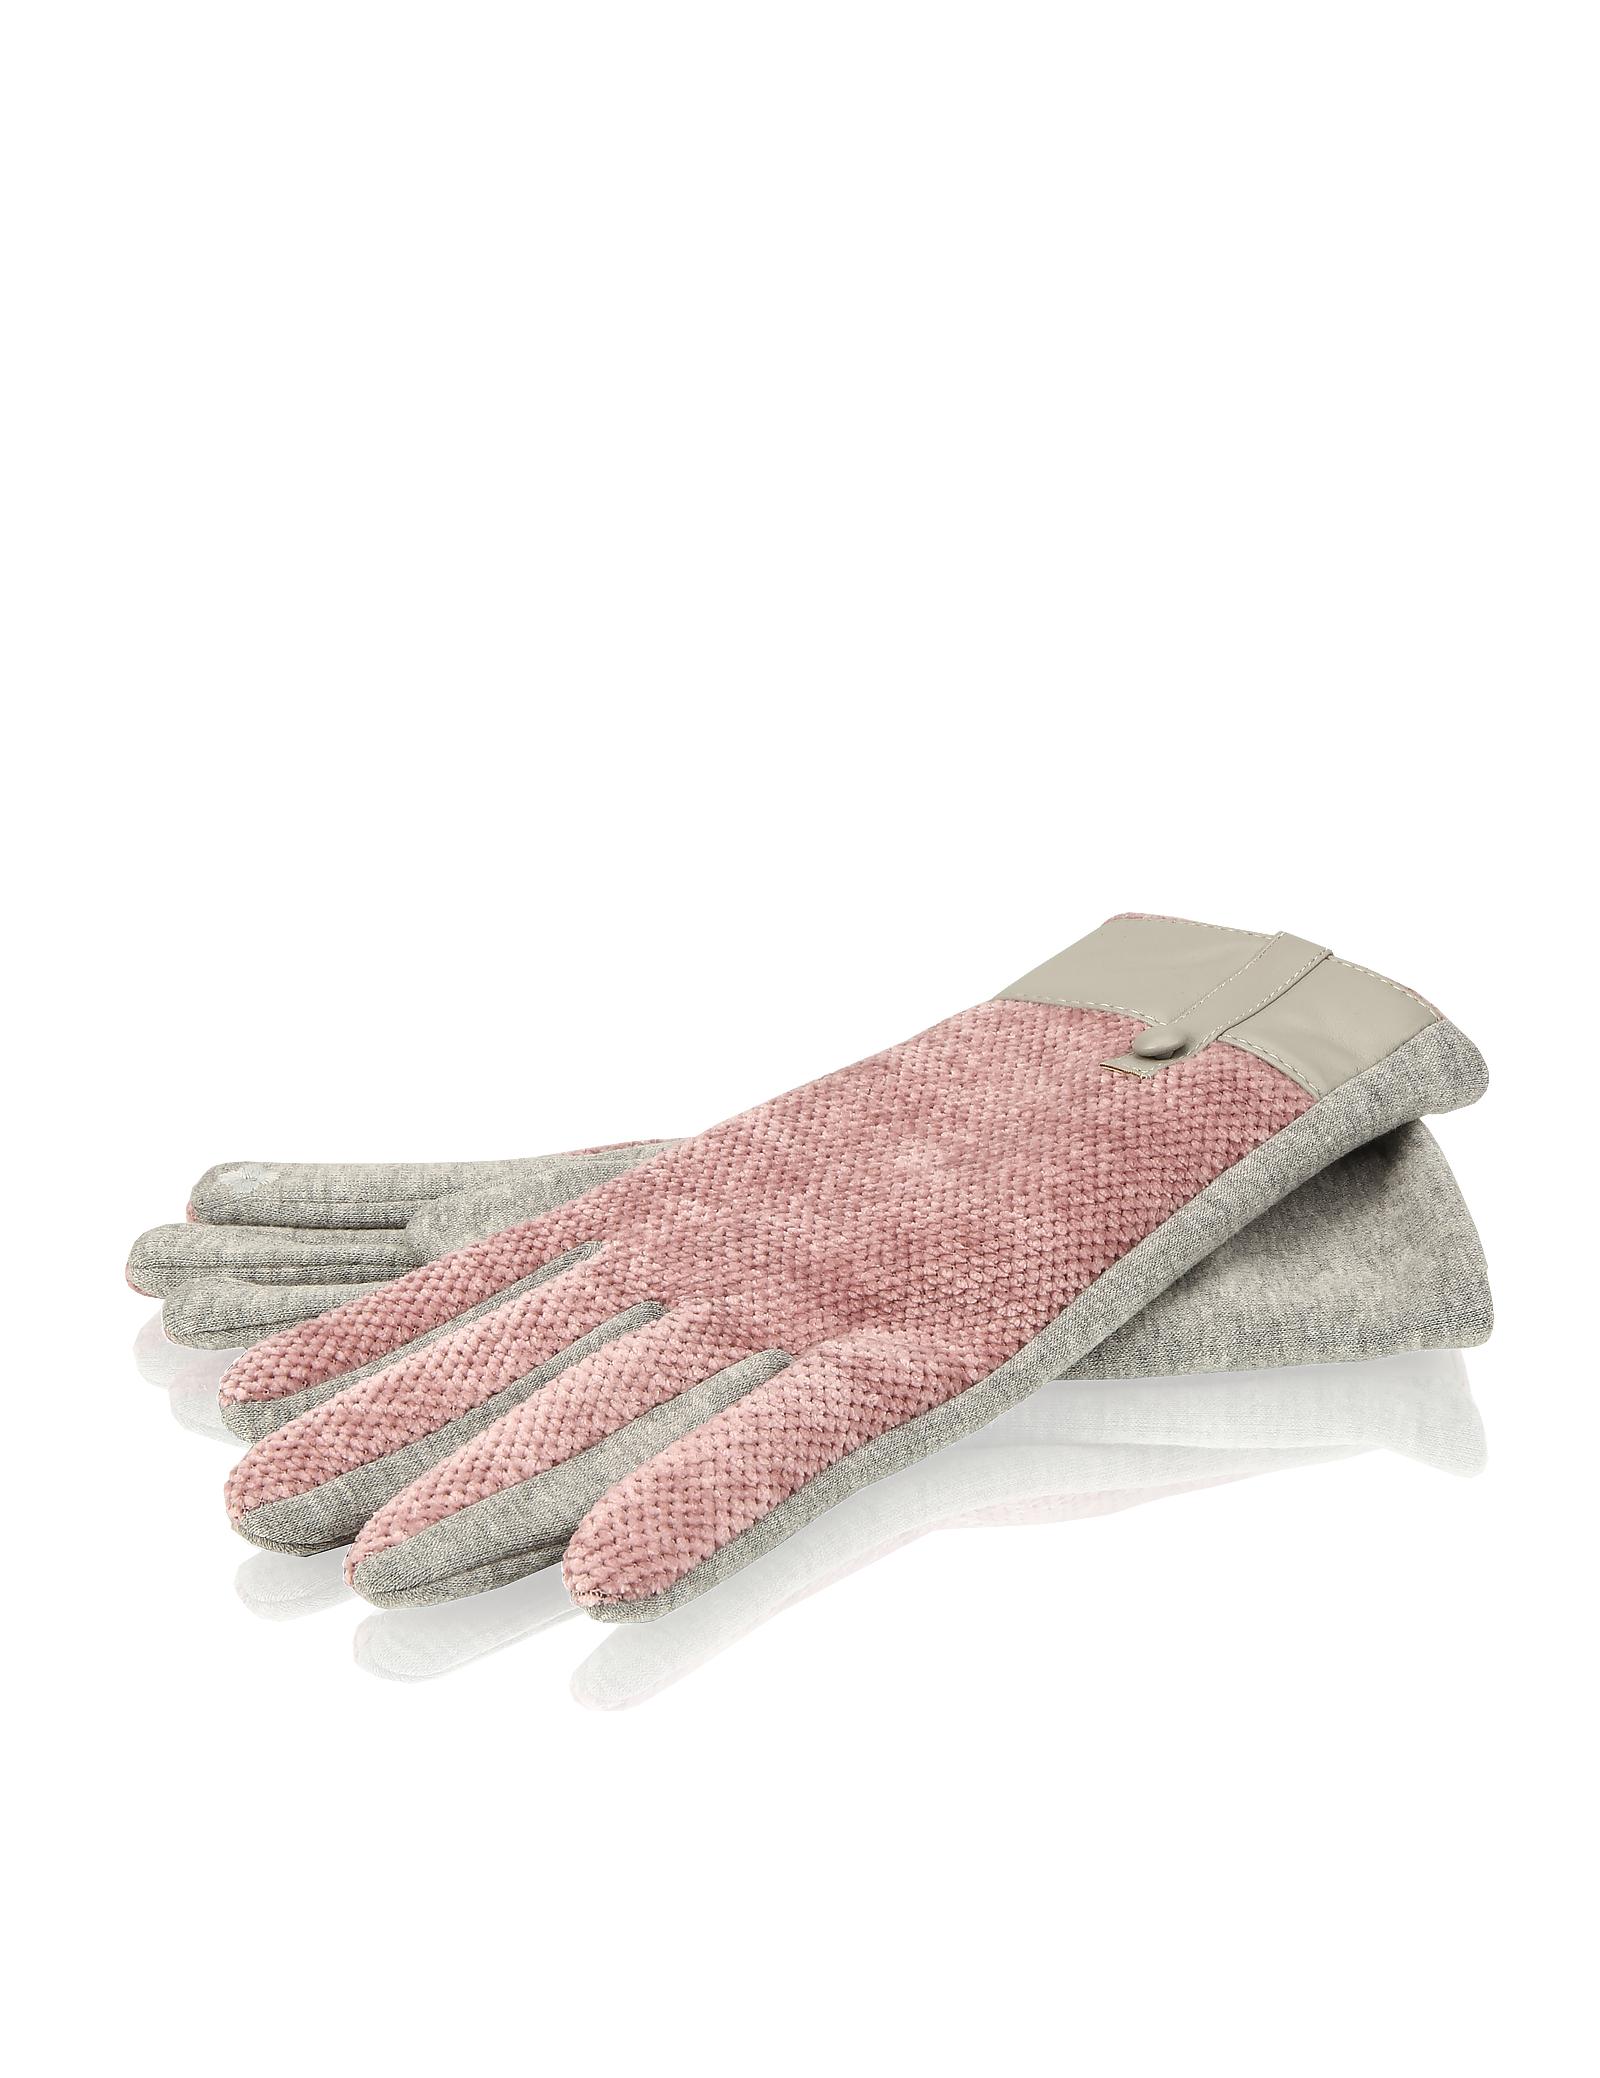 Handschuhe - Lazzarini Handschuh grau  - Onlineshop HUMANIC